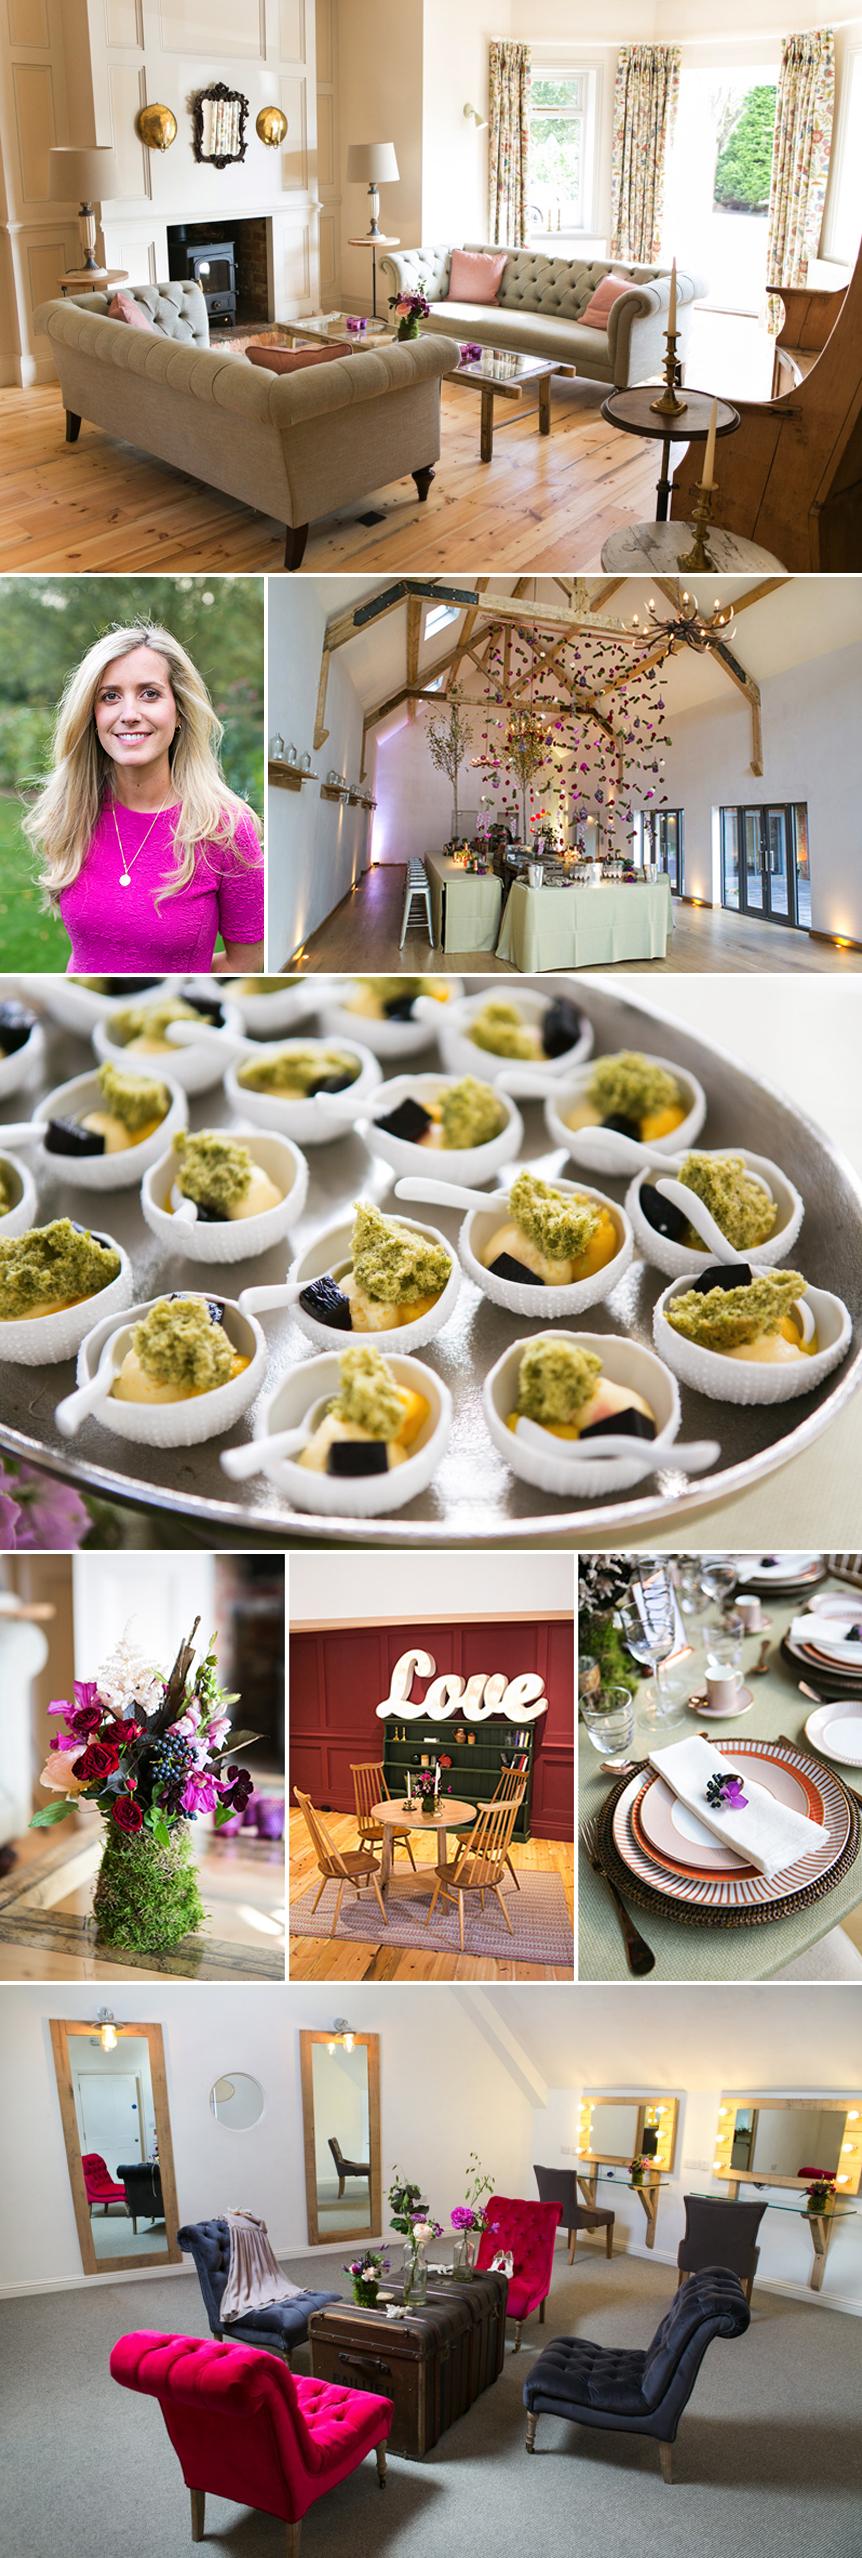 surrey-wedding-venue-millbridge-court-for-coco-wedding-venues-anneli-marinovich-photography-layer-1